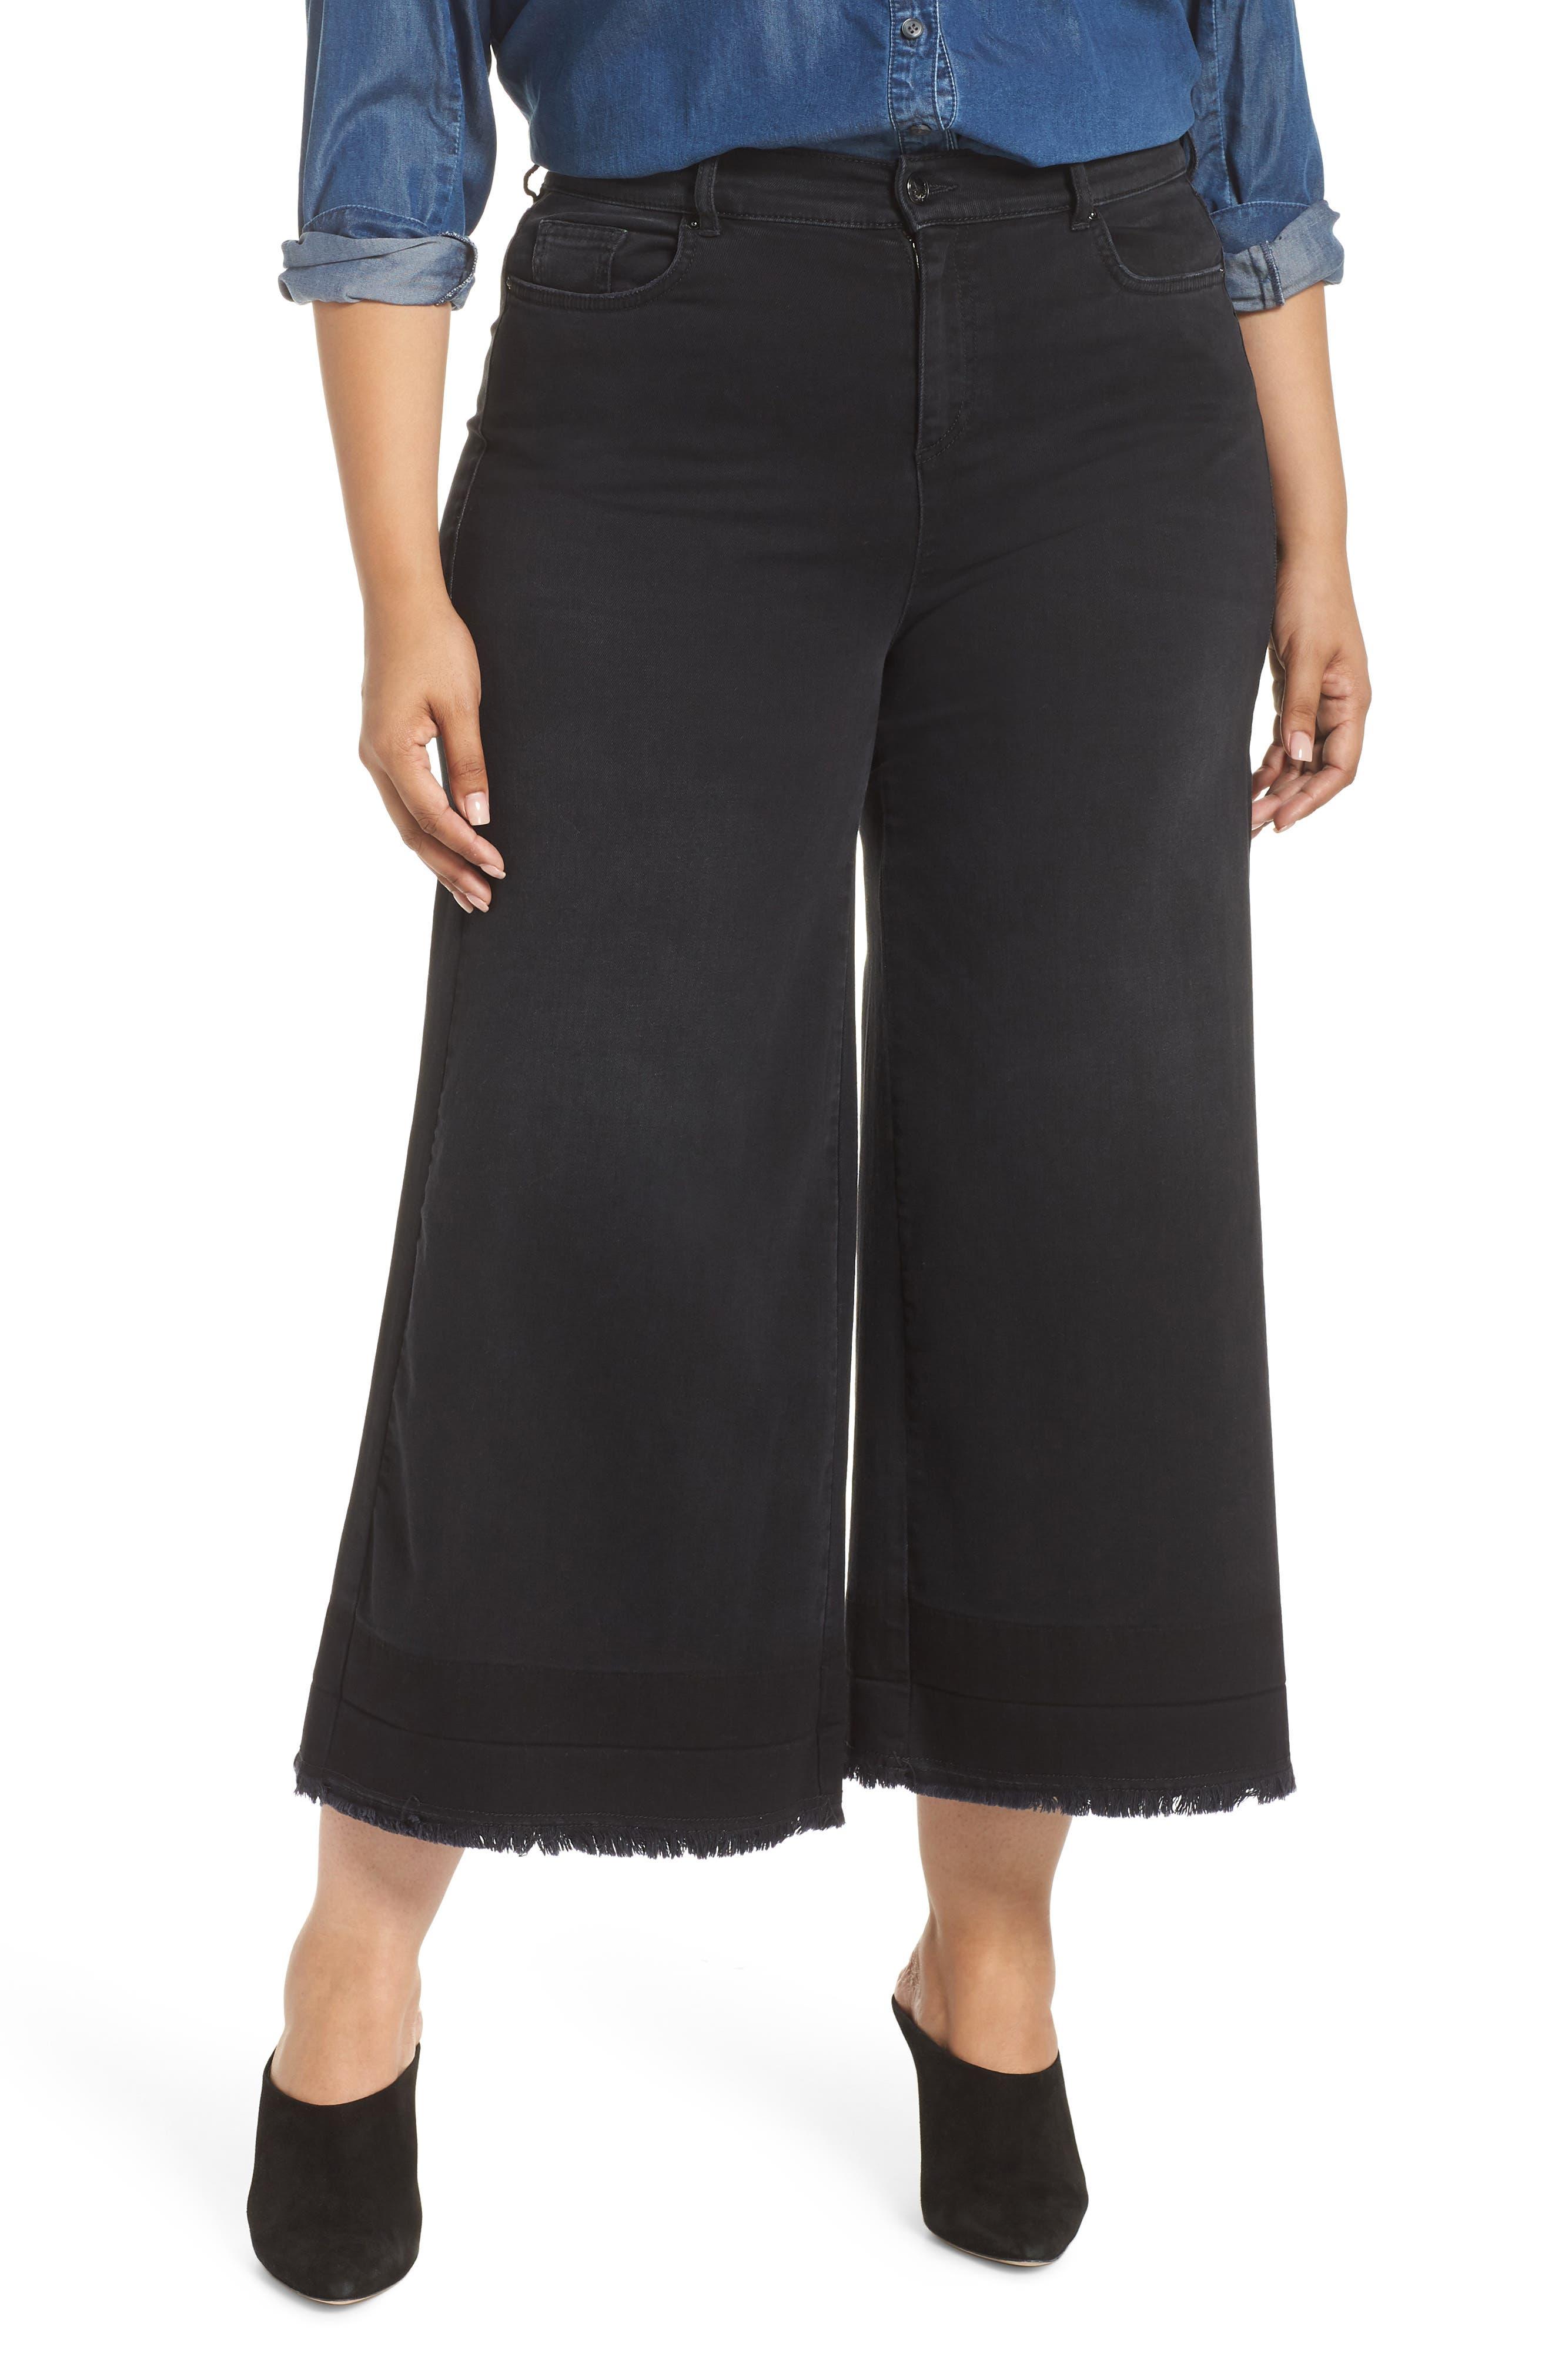 ASHLEY GRAHAM X MARINA RINALDI Igloo High Rise Crop Flare Jeans in Black 2